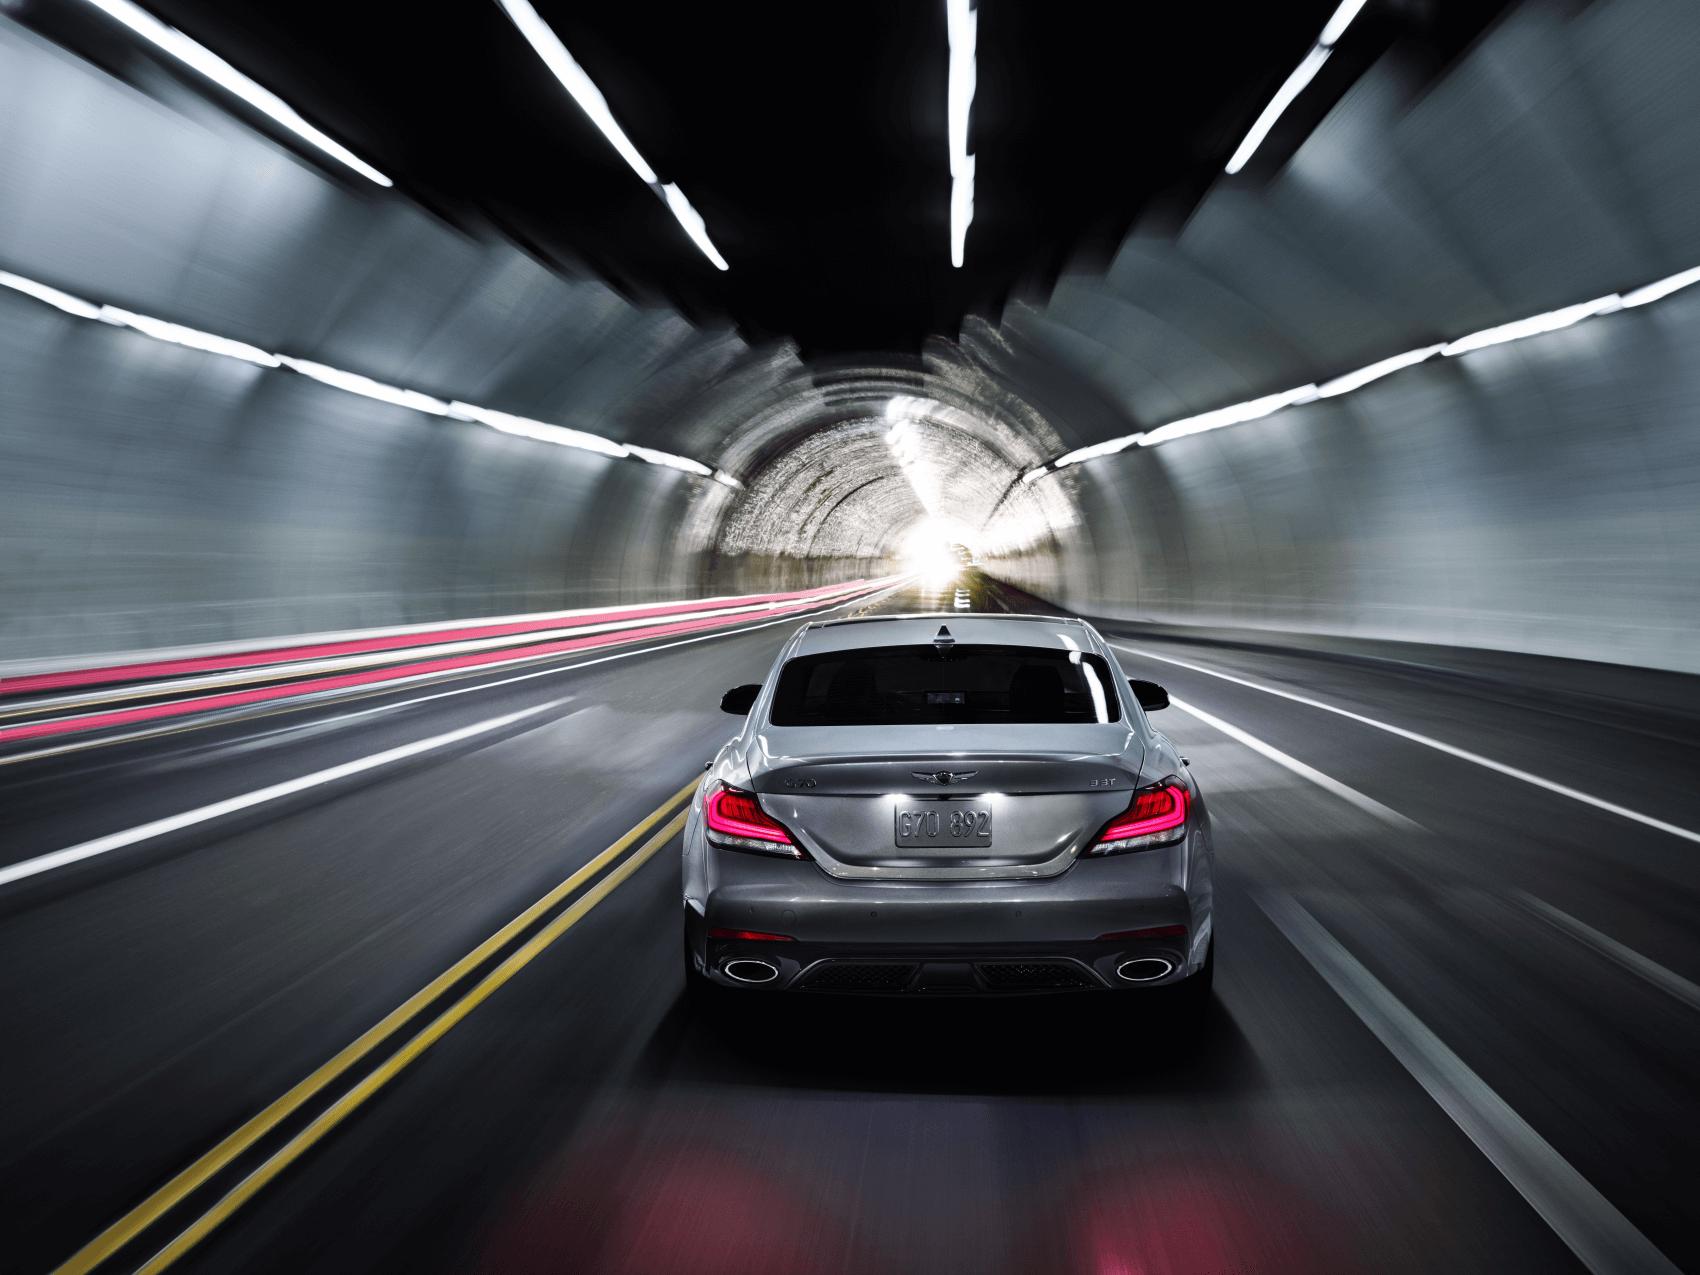 Genesis G70 Silver Tunnel